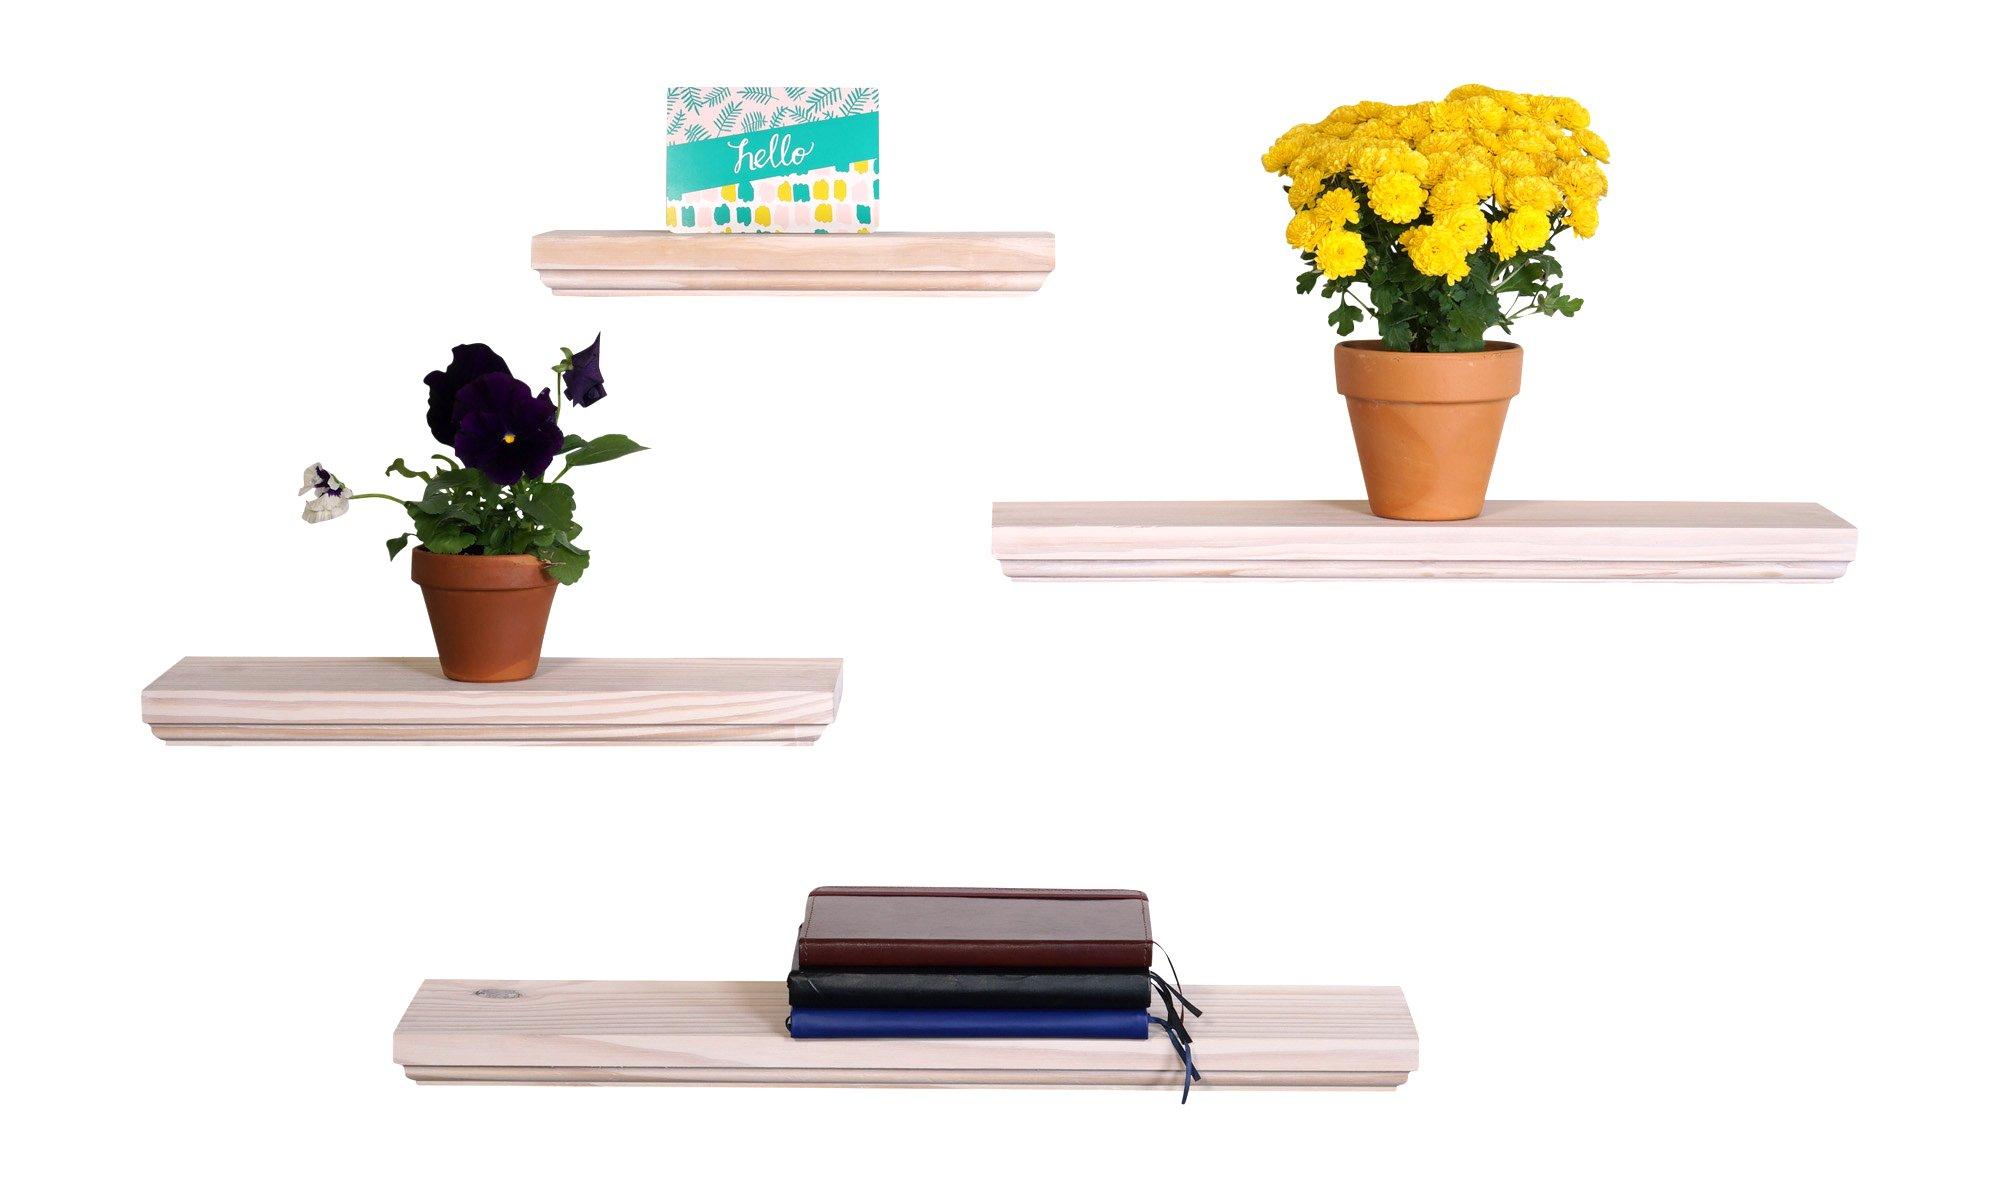 DAKODA LOVE Routed Edge Floating Shelves, USA Handmade, White Stain Finish, 100% Countersunk Hidden Floating Shelf Brackets, Beautiful Grain Pine Wood Wall Decor (Set of 4) (Cloud)